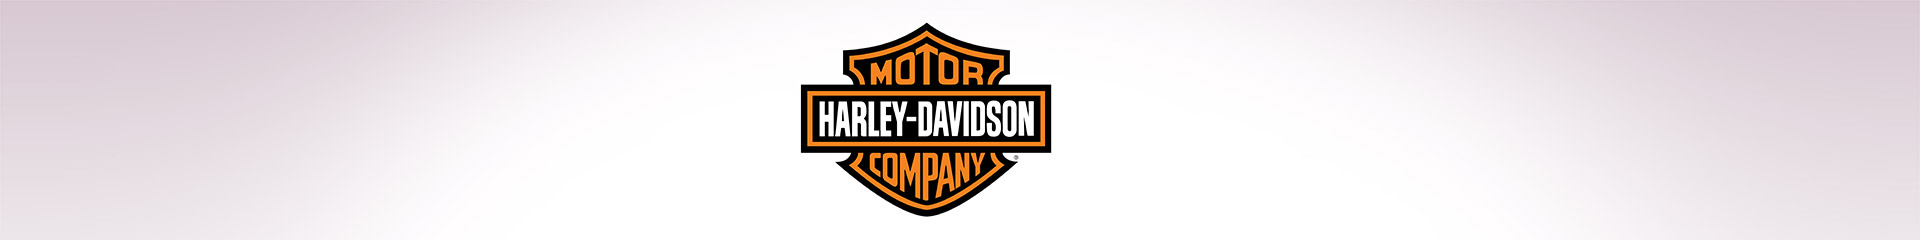 Ricambi Harley-Davidson